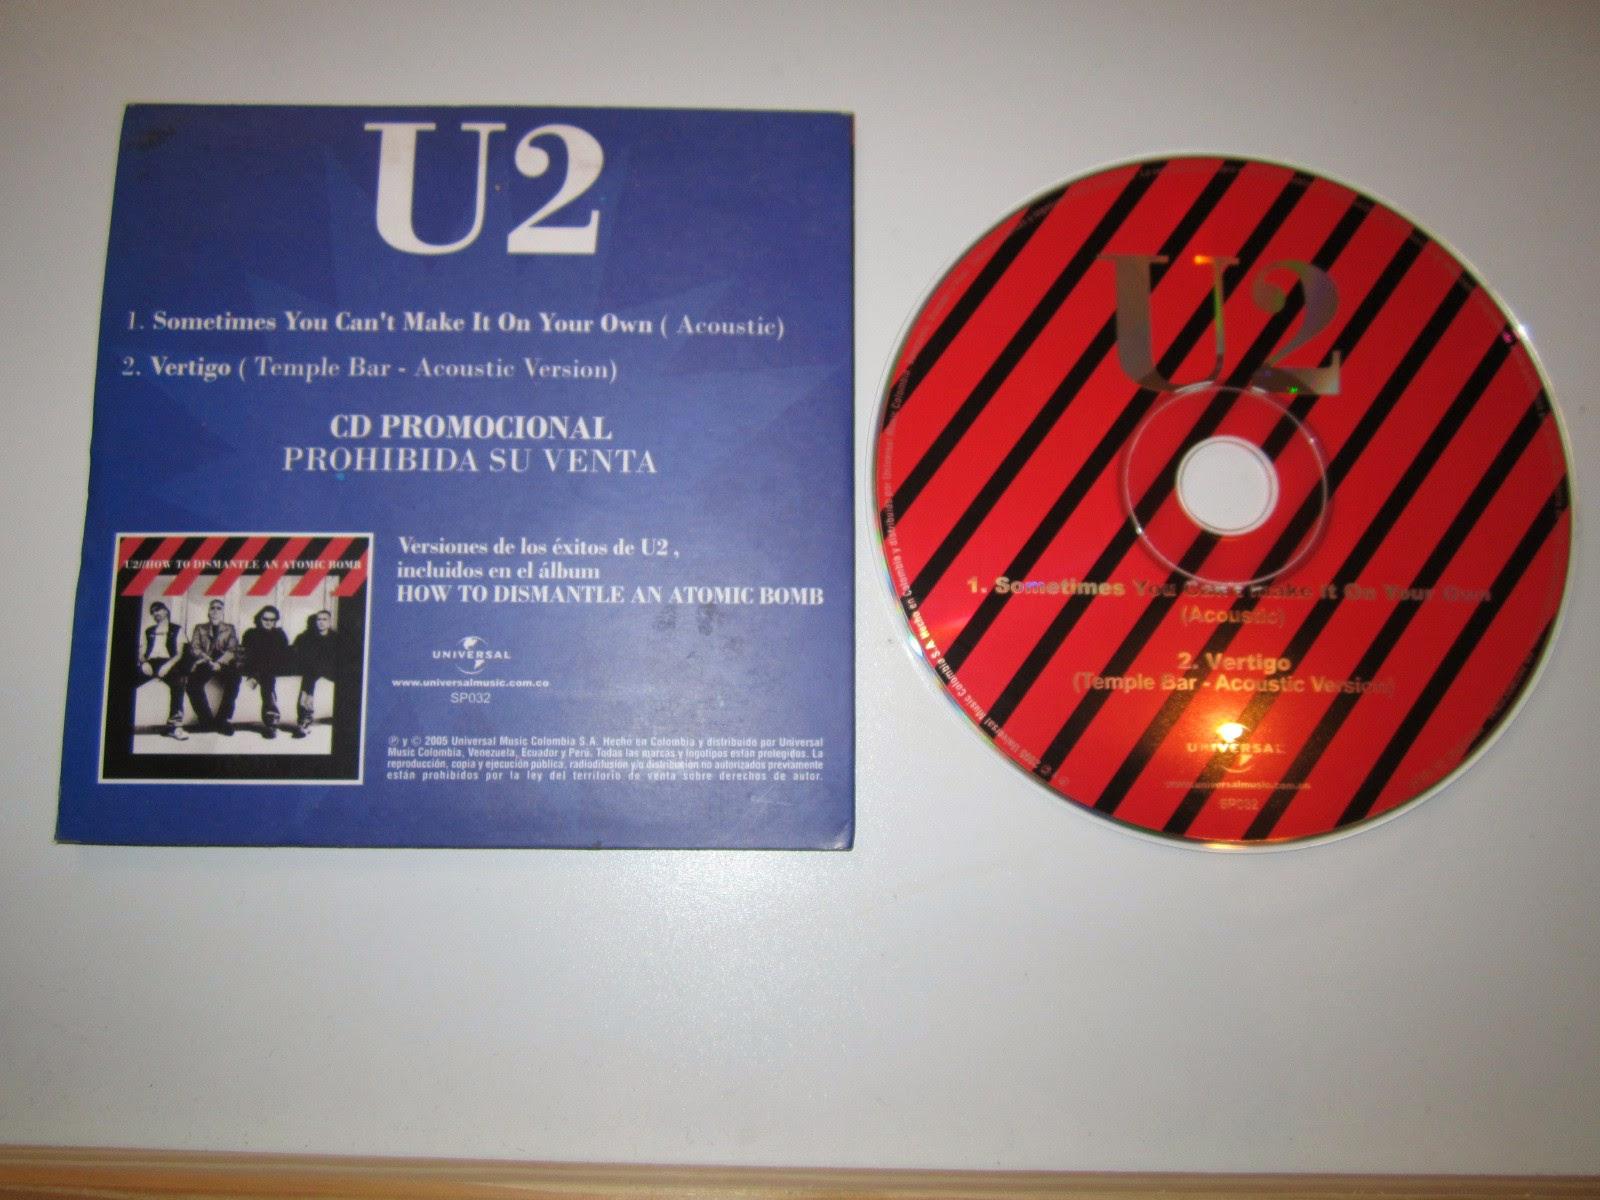 U2 colombian promo -